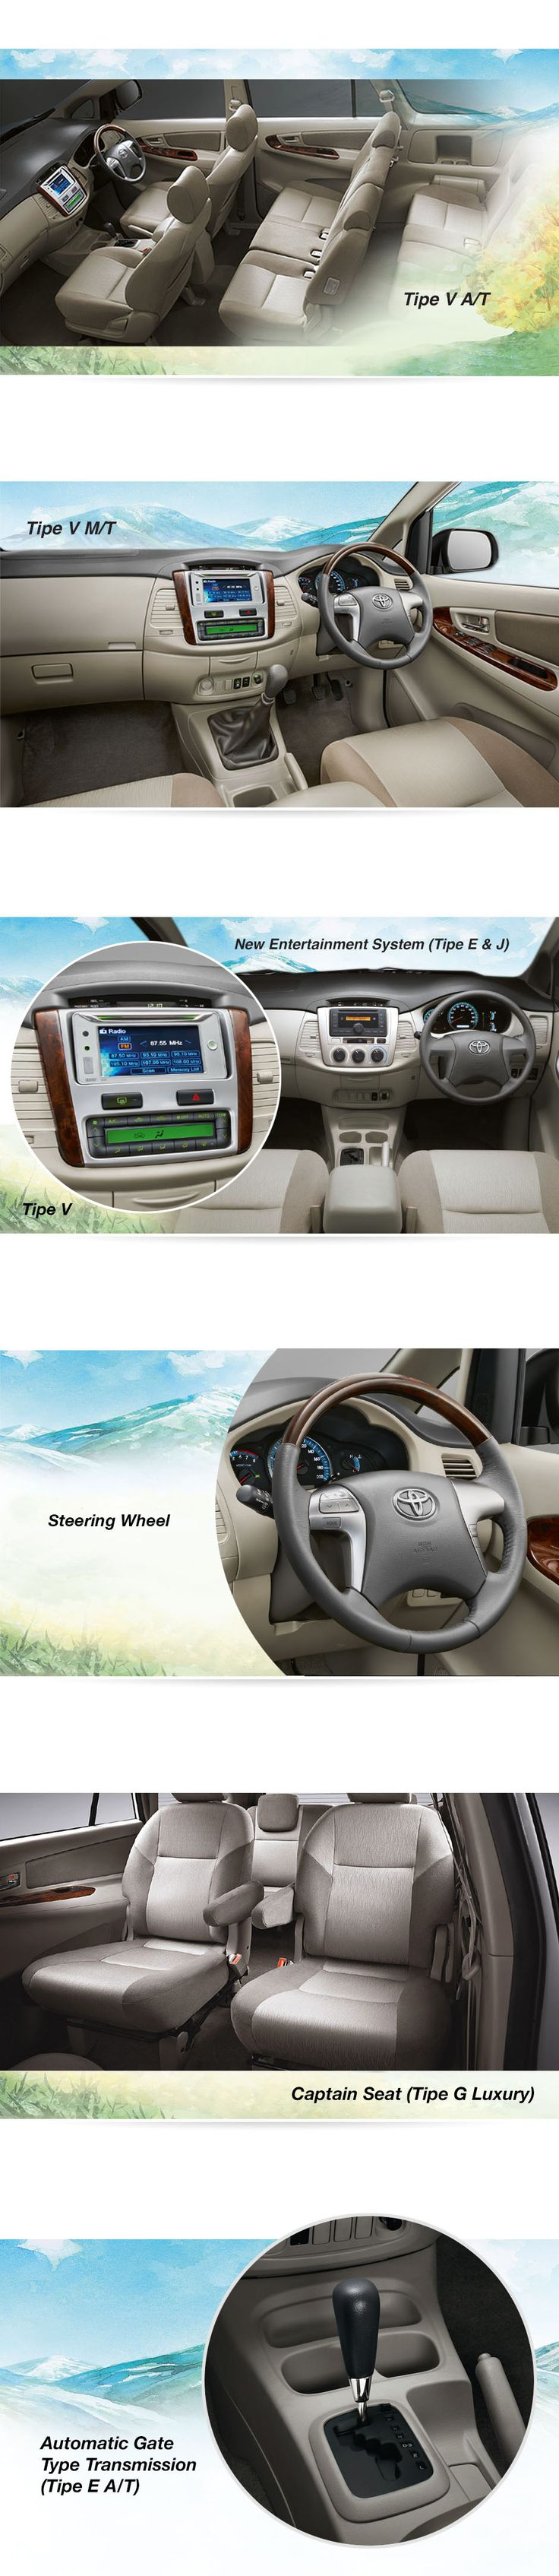 Harga,Toyota, Kijang New Innova, Madiun, Terbaru